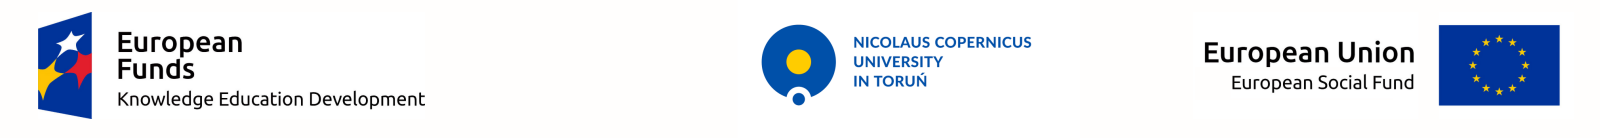 European Funds KED - UMK - EU ESF